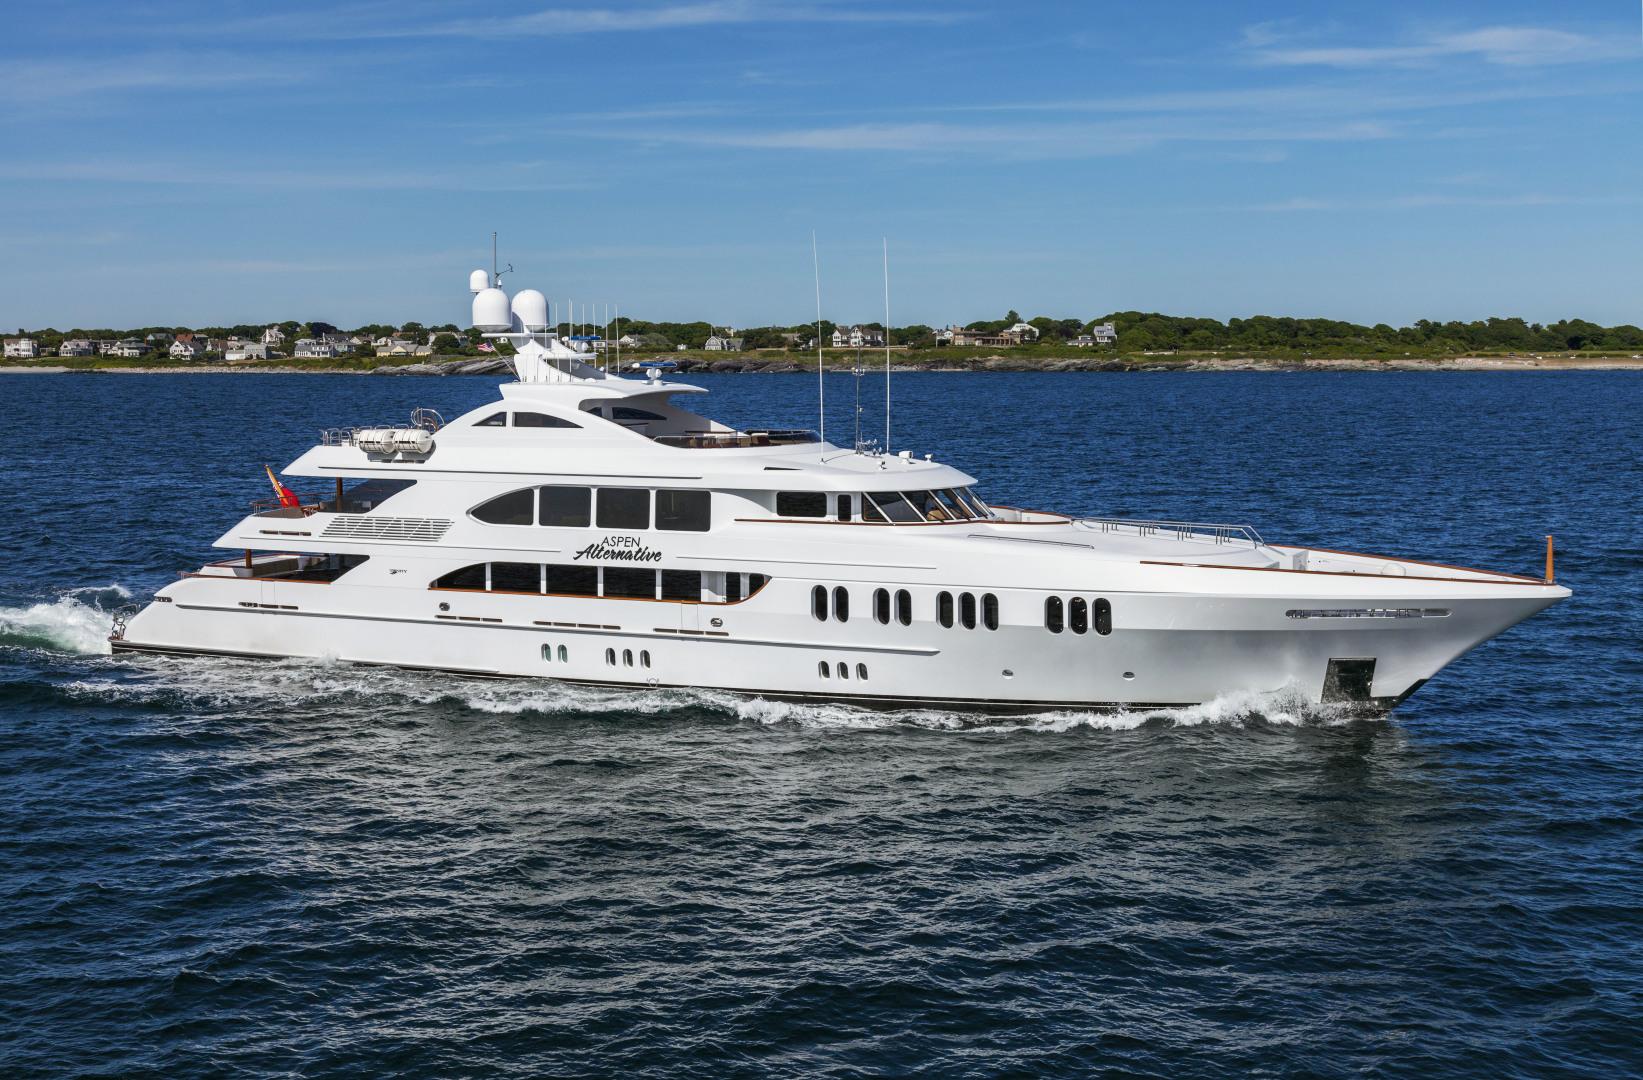 164' Trinity Yachts 2010 Tri-Deck Motor Yacht ASPEN ALTERNATIVE